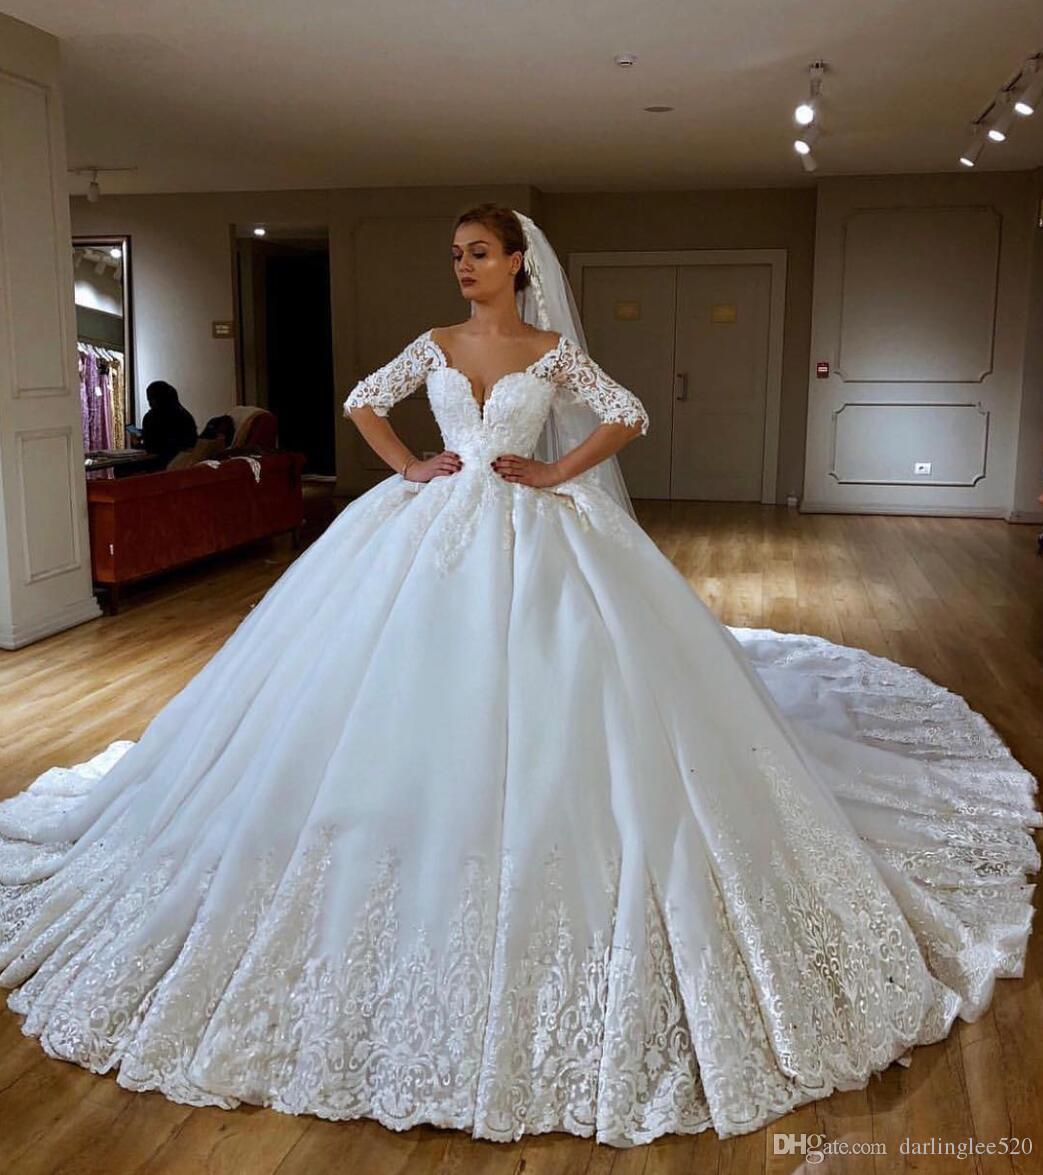 a00045d1f43 Vestido De Novia Wedding Dress A Line Satin Sweetheart Neckline Illusion  Long Sleeve Applique Chapel Train Beads Luxury Wedding Bridal Gown Bridal  Gowns ...